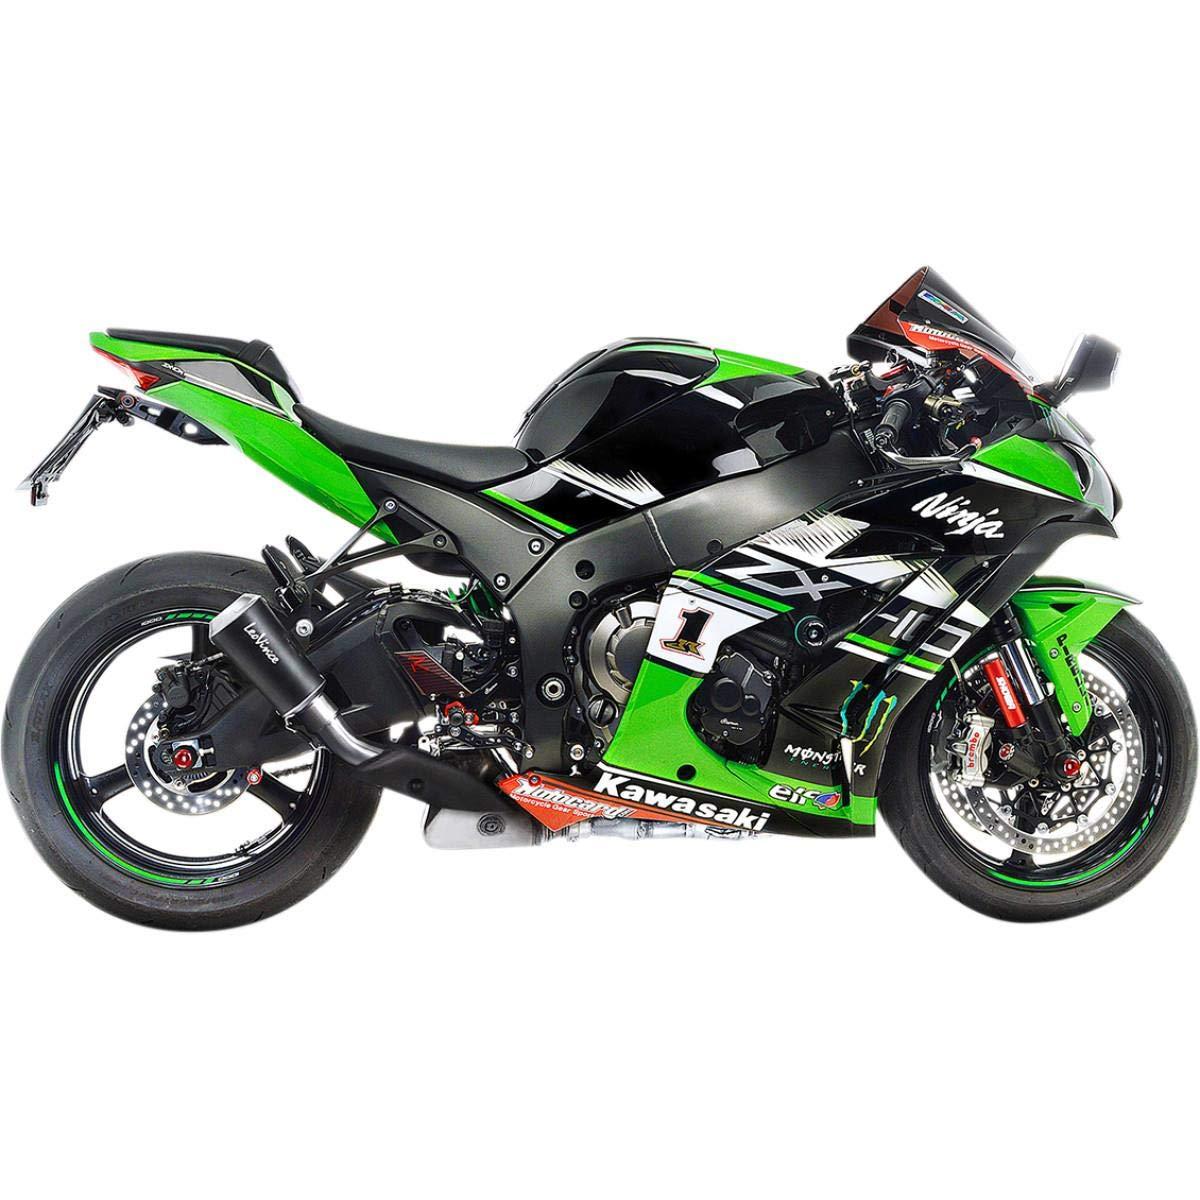 Amazoncom 16 18 Kawasaki Zx10r Leo Vince Lv 10 Slip On Exhaust